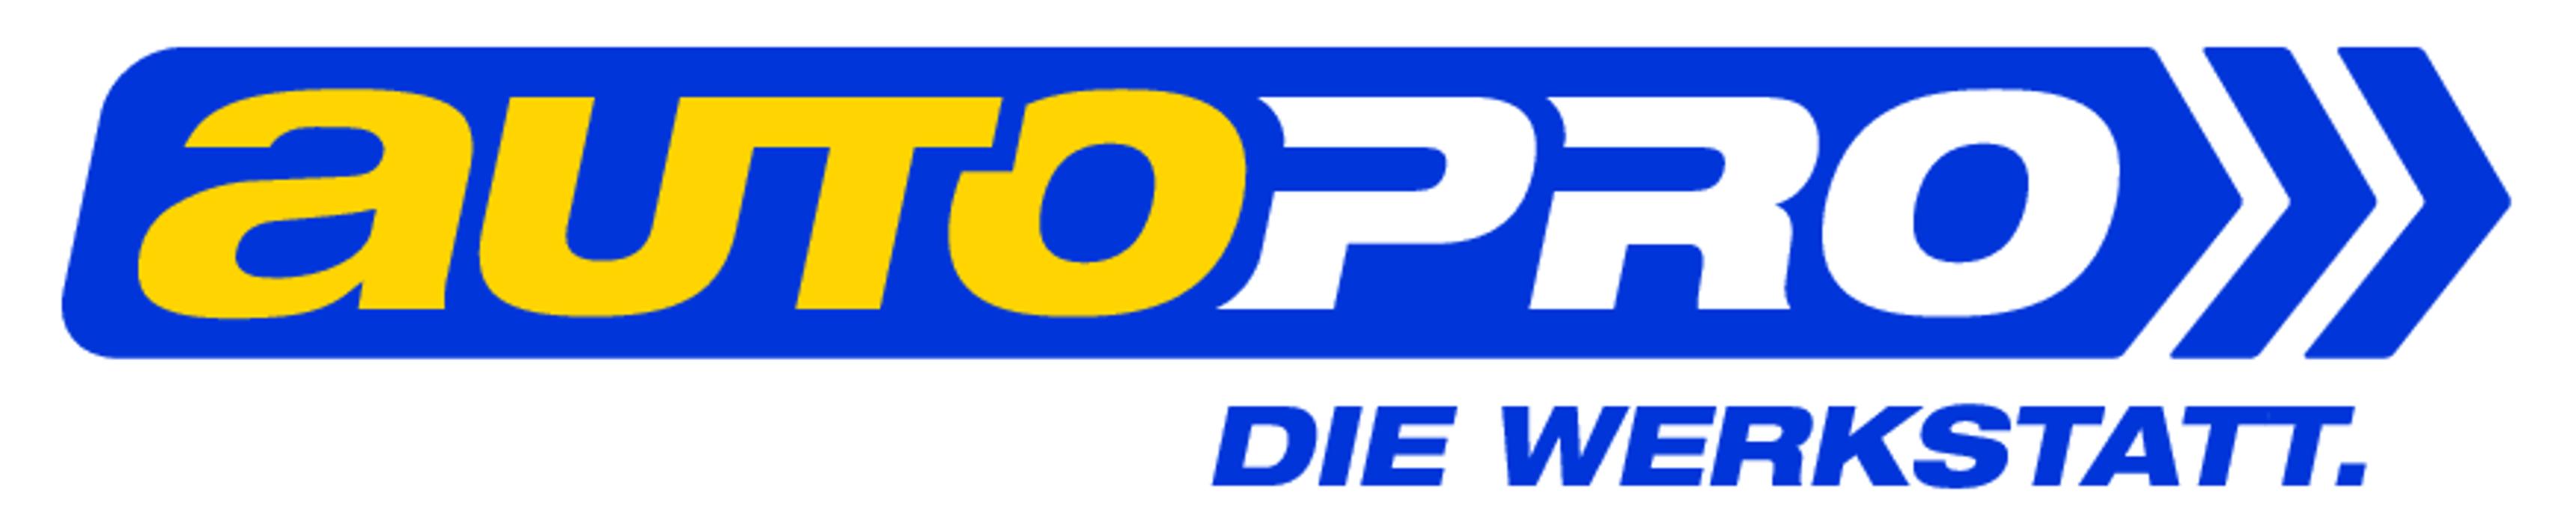 Bild zu Kraftfahrzeugtechnik Haase , Schmidz & Prüß GbR in Delmenhorst